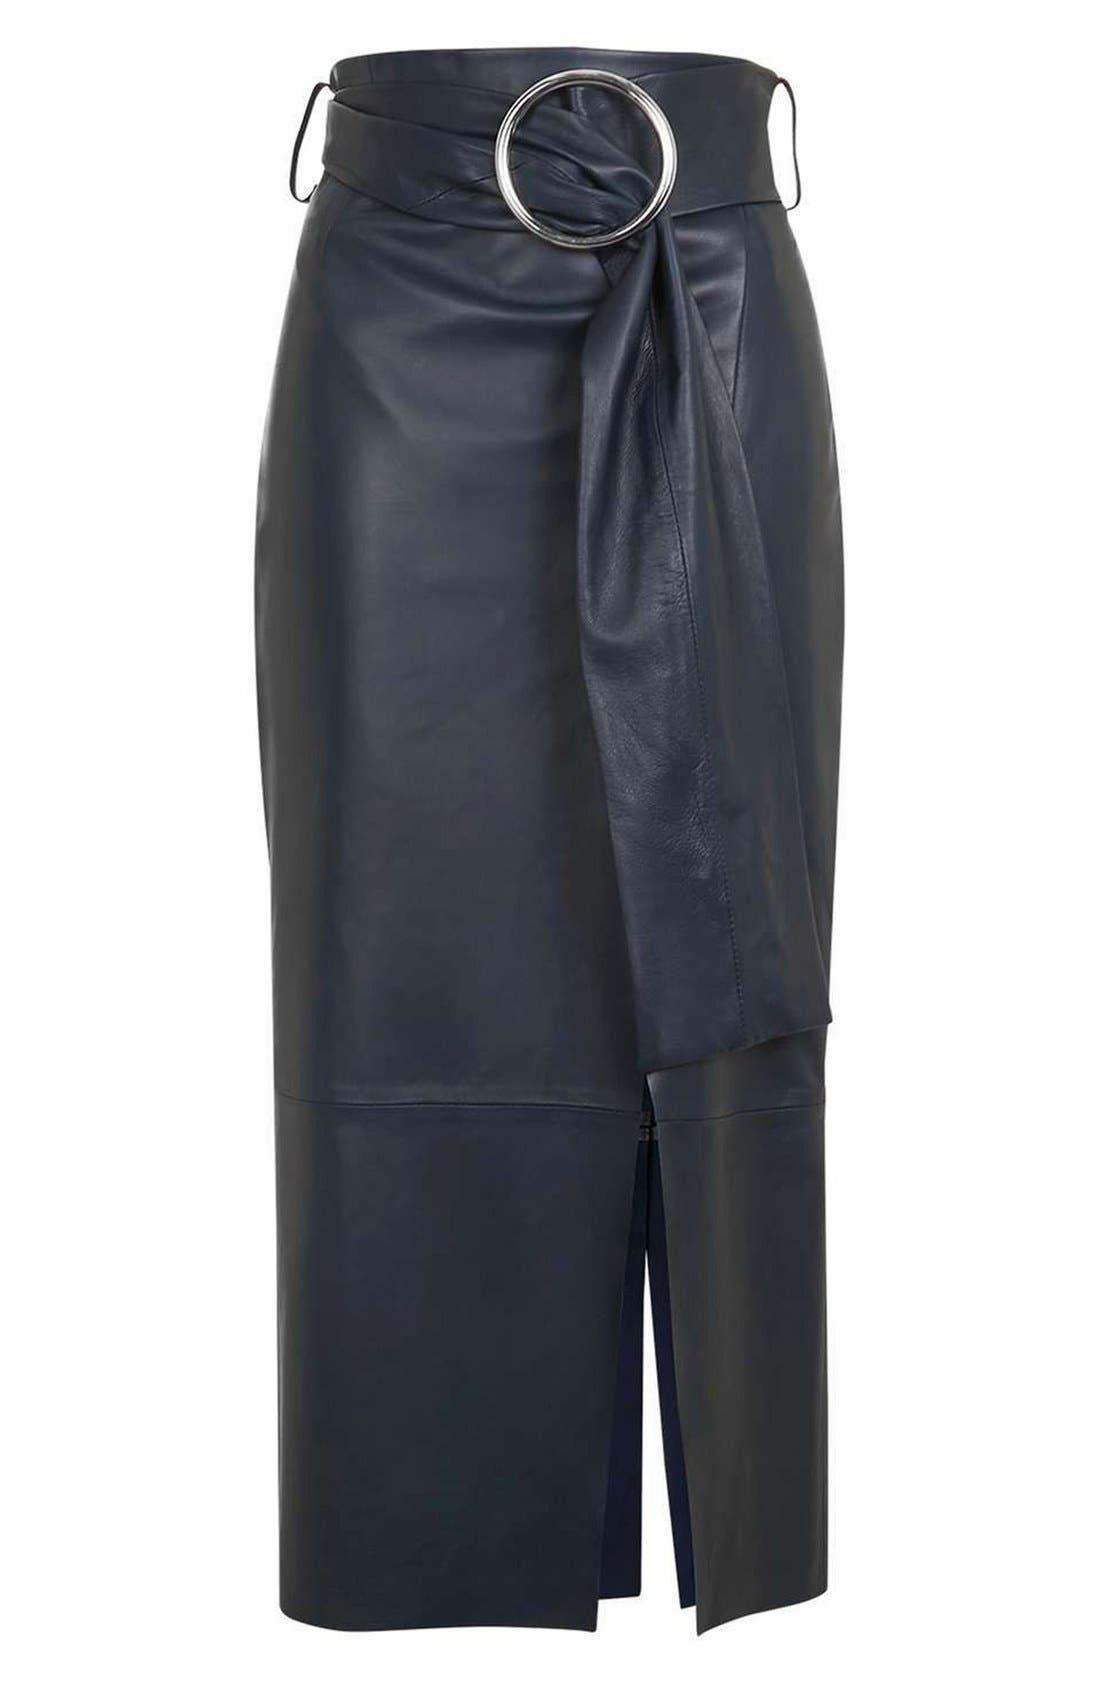 Alternate Image 1 Selected - Topshop Boutique Belted Leather Skirt